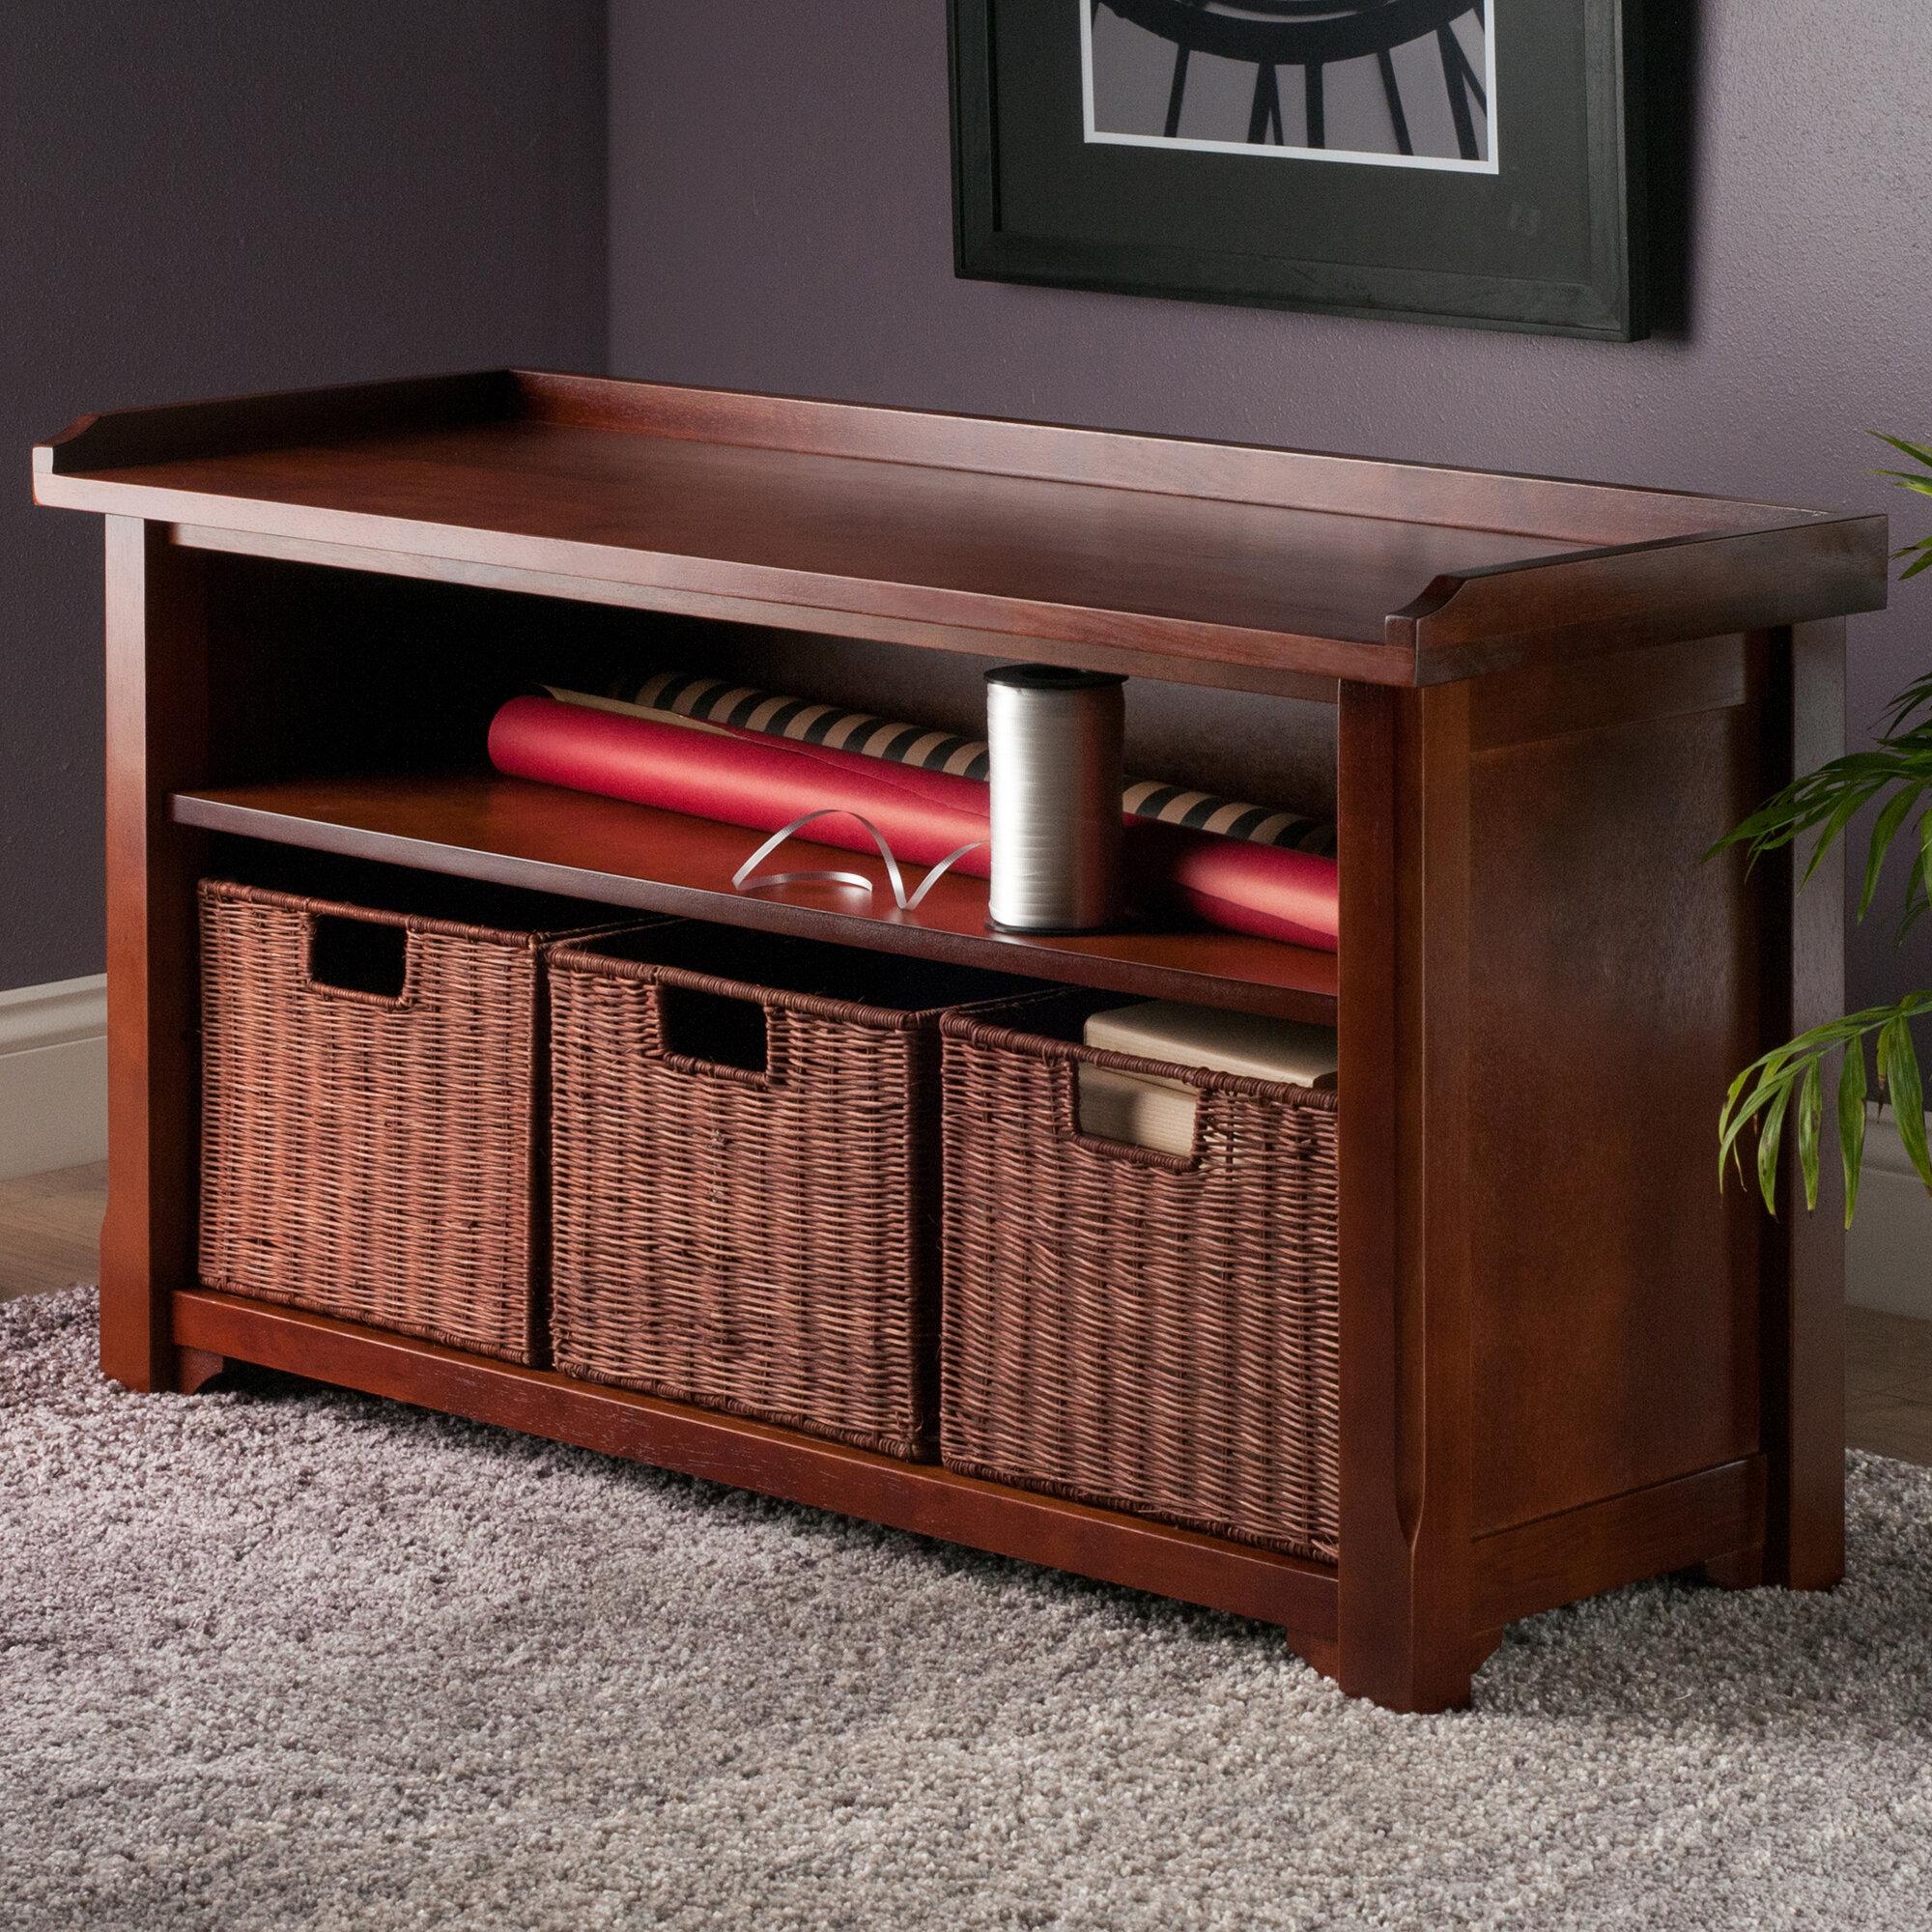 Red Barrel Studio Alasan Wood Storage Bench Reviews Wayfair